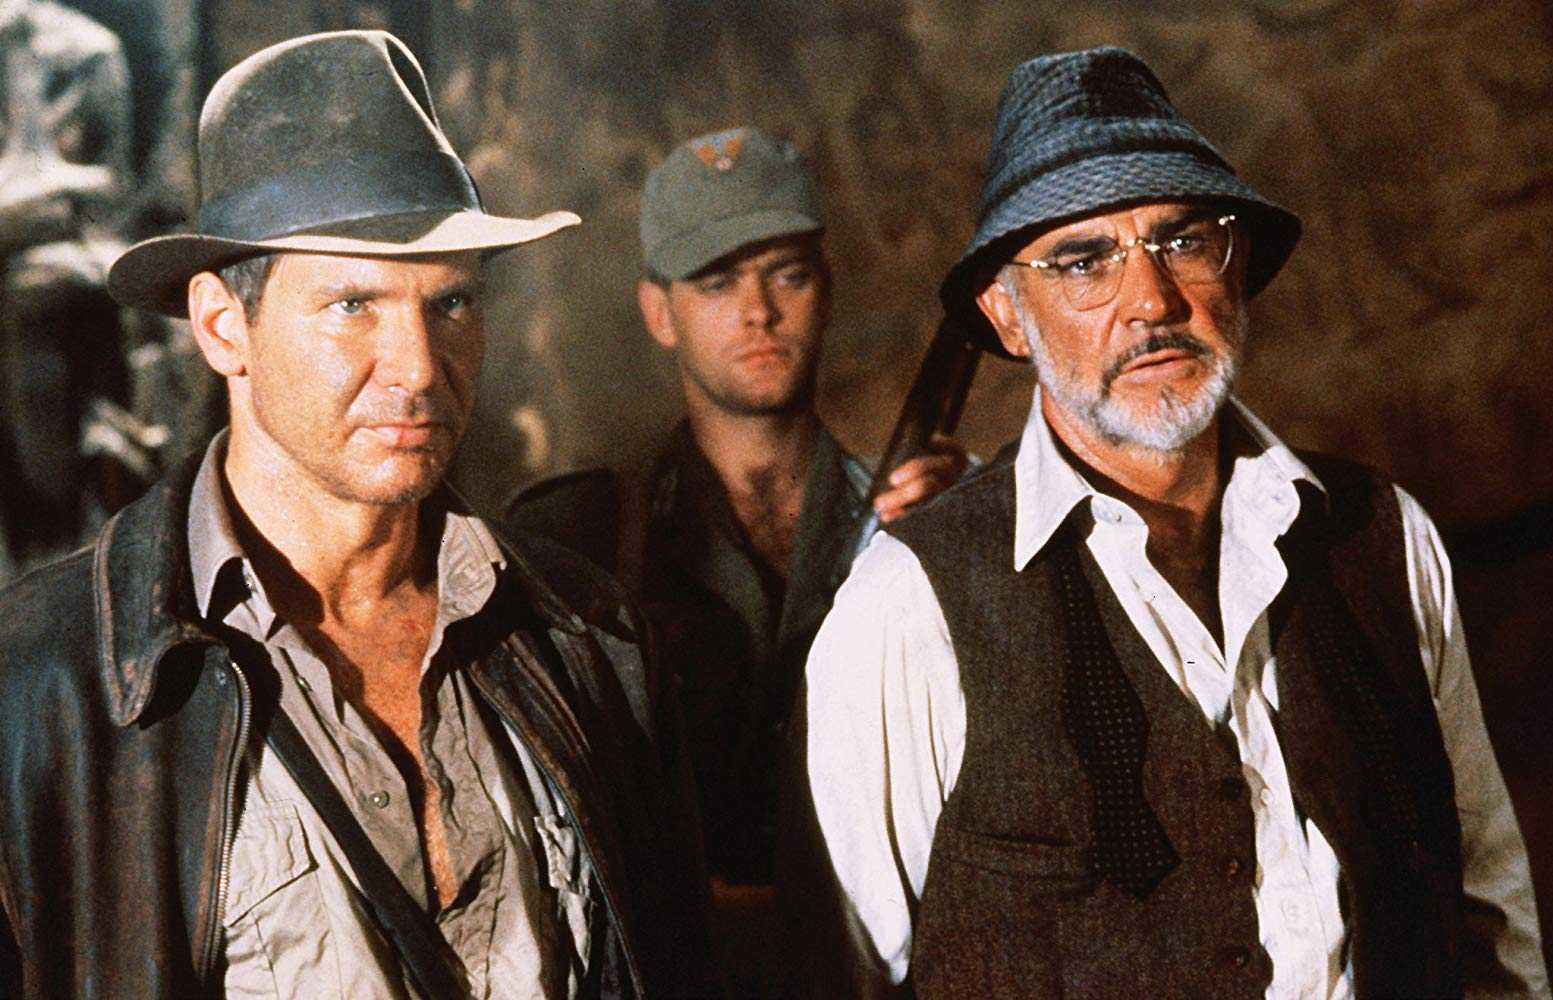 Steven Spielberg filmleri Indiana Jones: Son Macera filmi